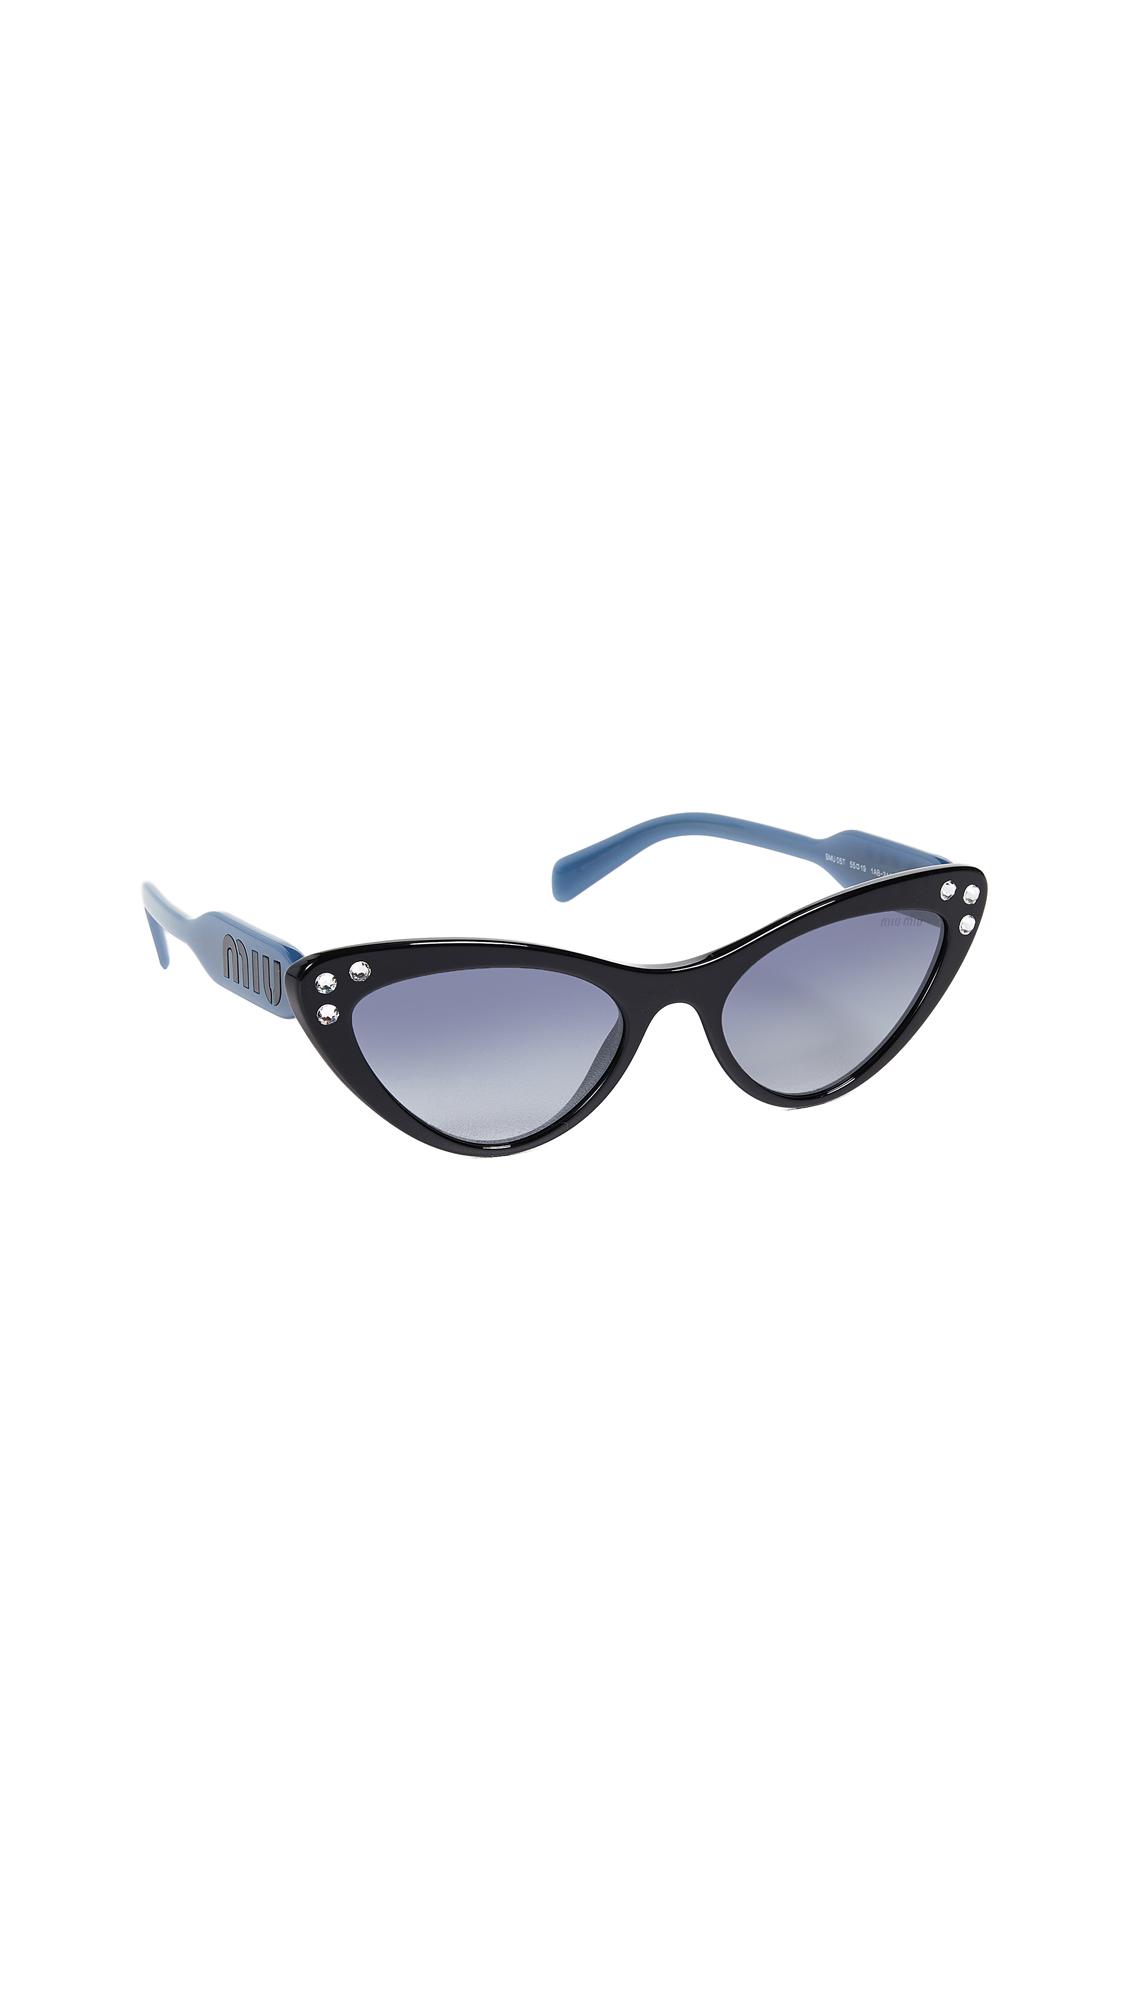 Crystals Cat Eye Sunglasses, Black/Blue Mirror